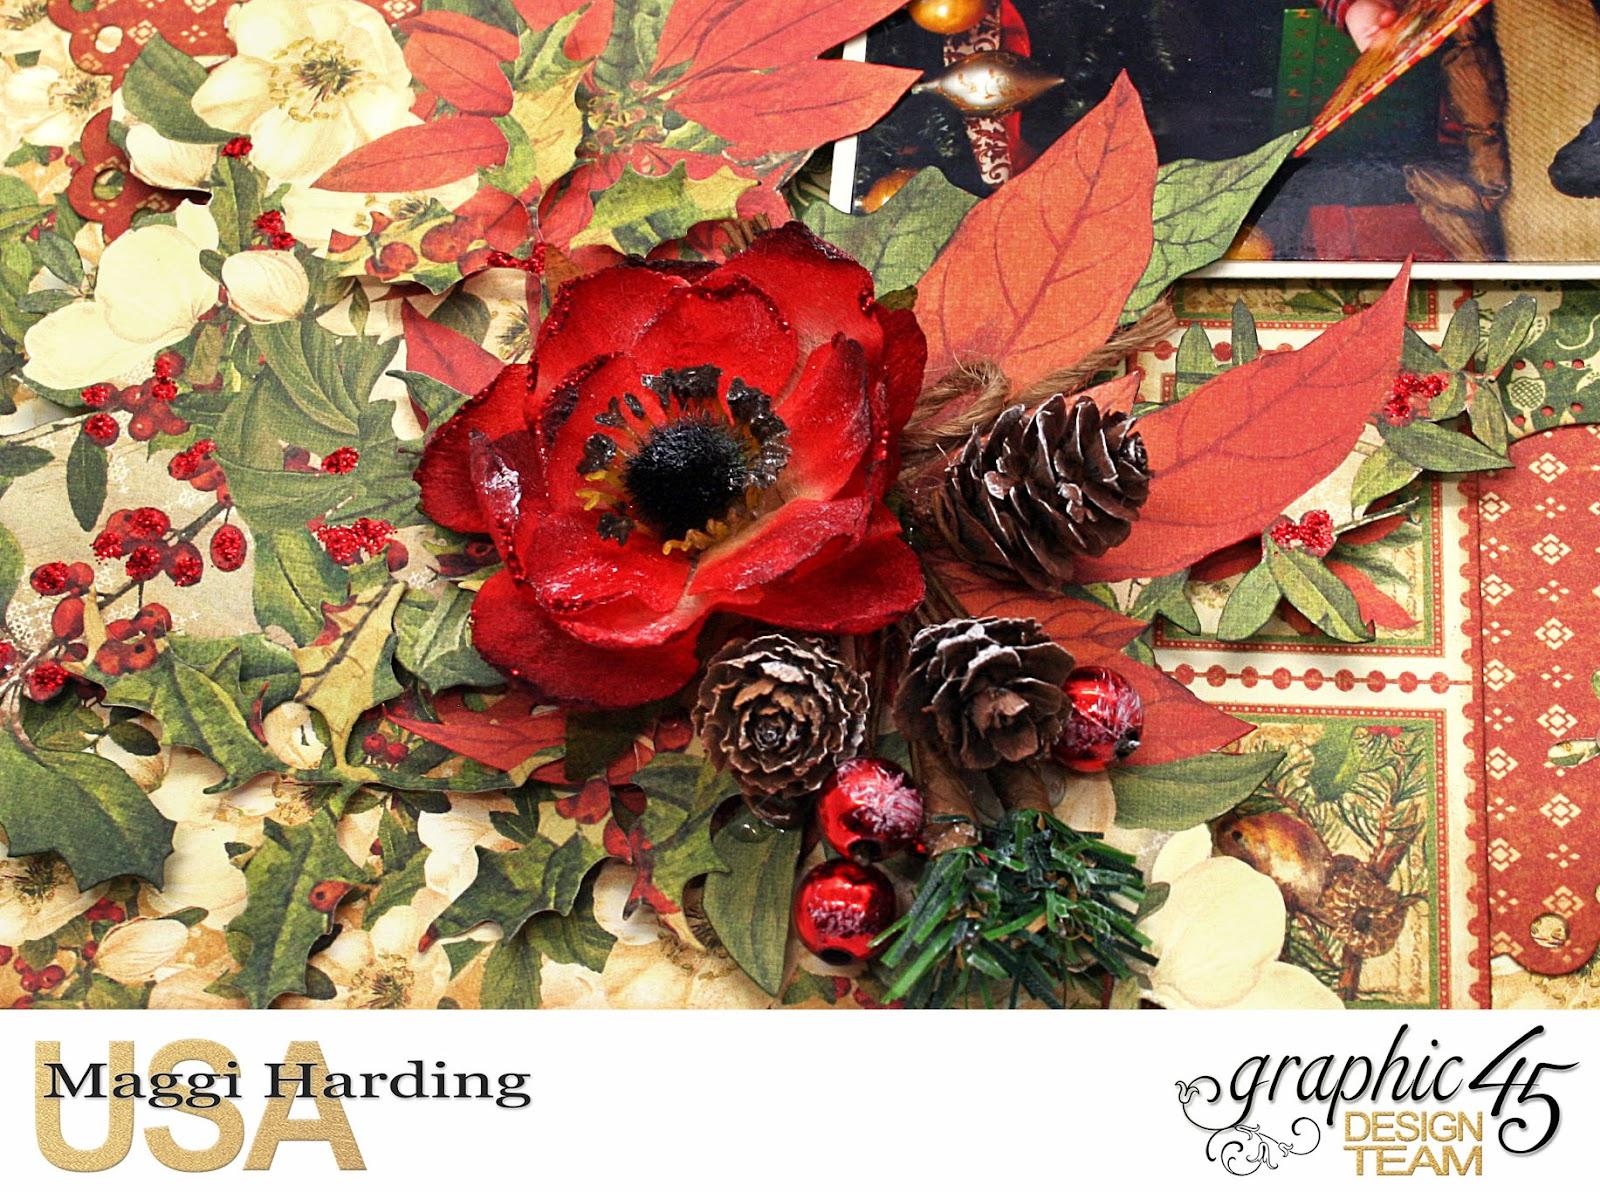 Layout, Winter Wonderland, Maggi Harding, Graphic 45 (2).jpg